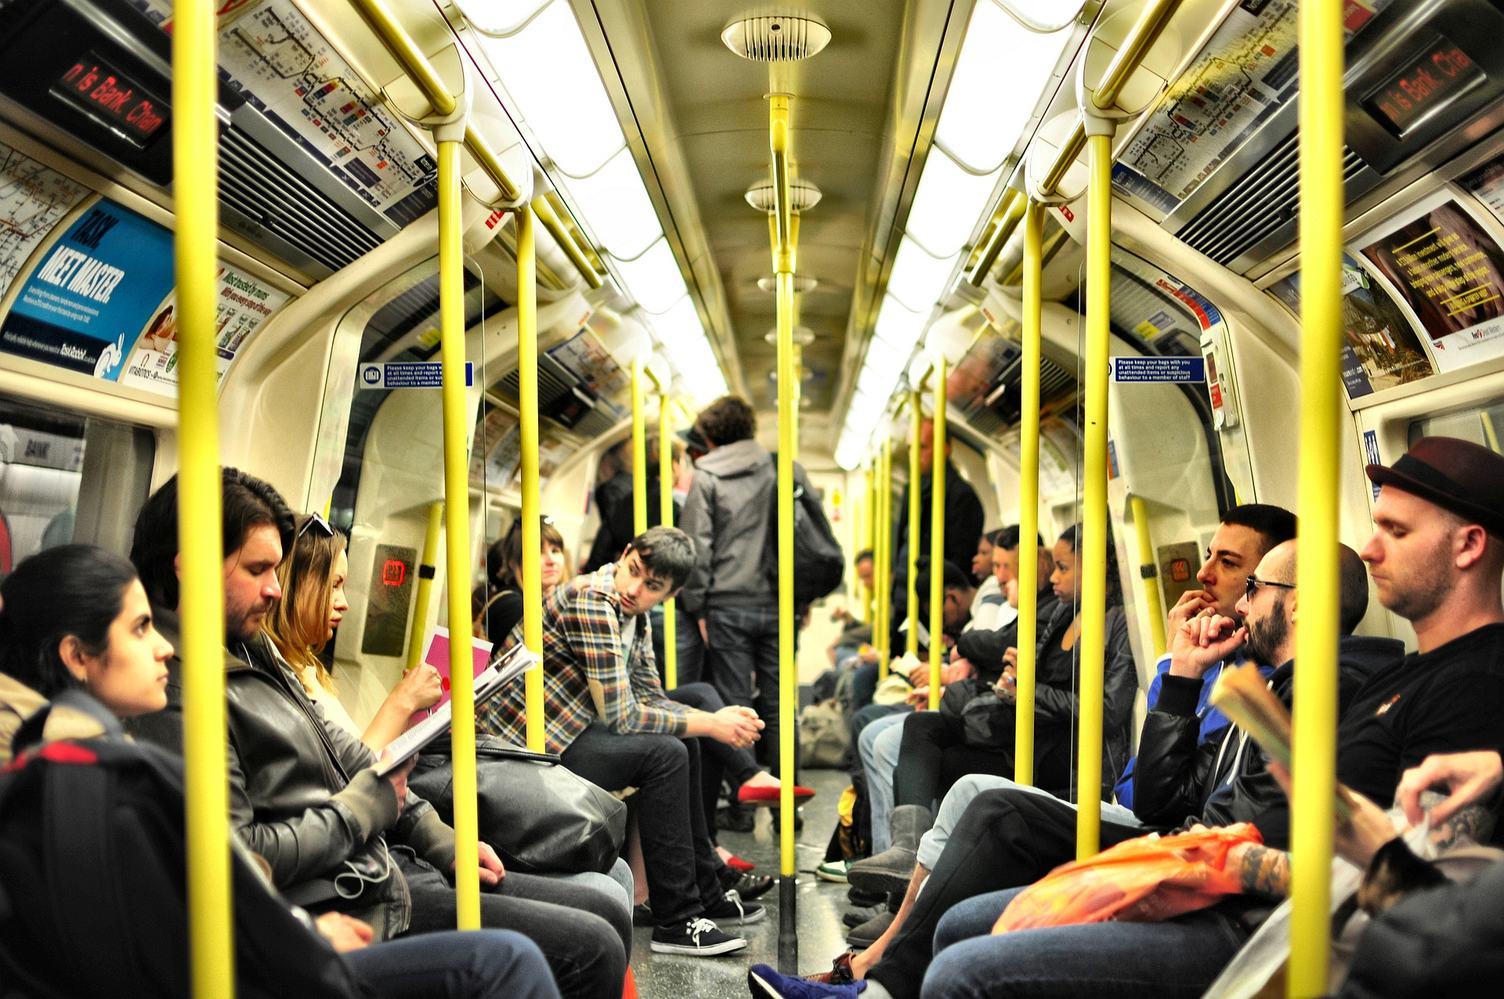 Passengers Sitting in the Subway Wagon